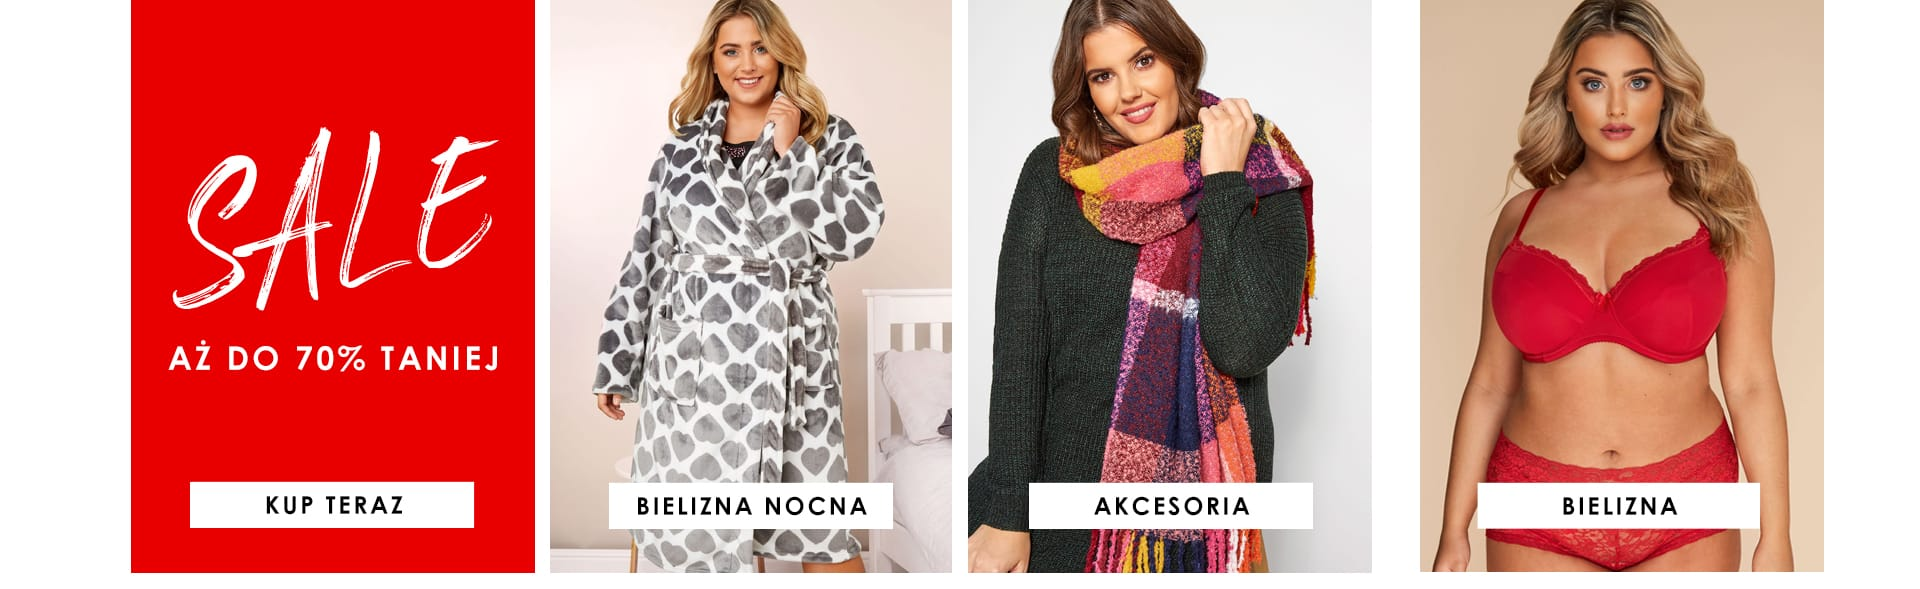 nightwear, accessories & bielizna >